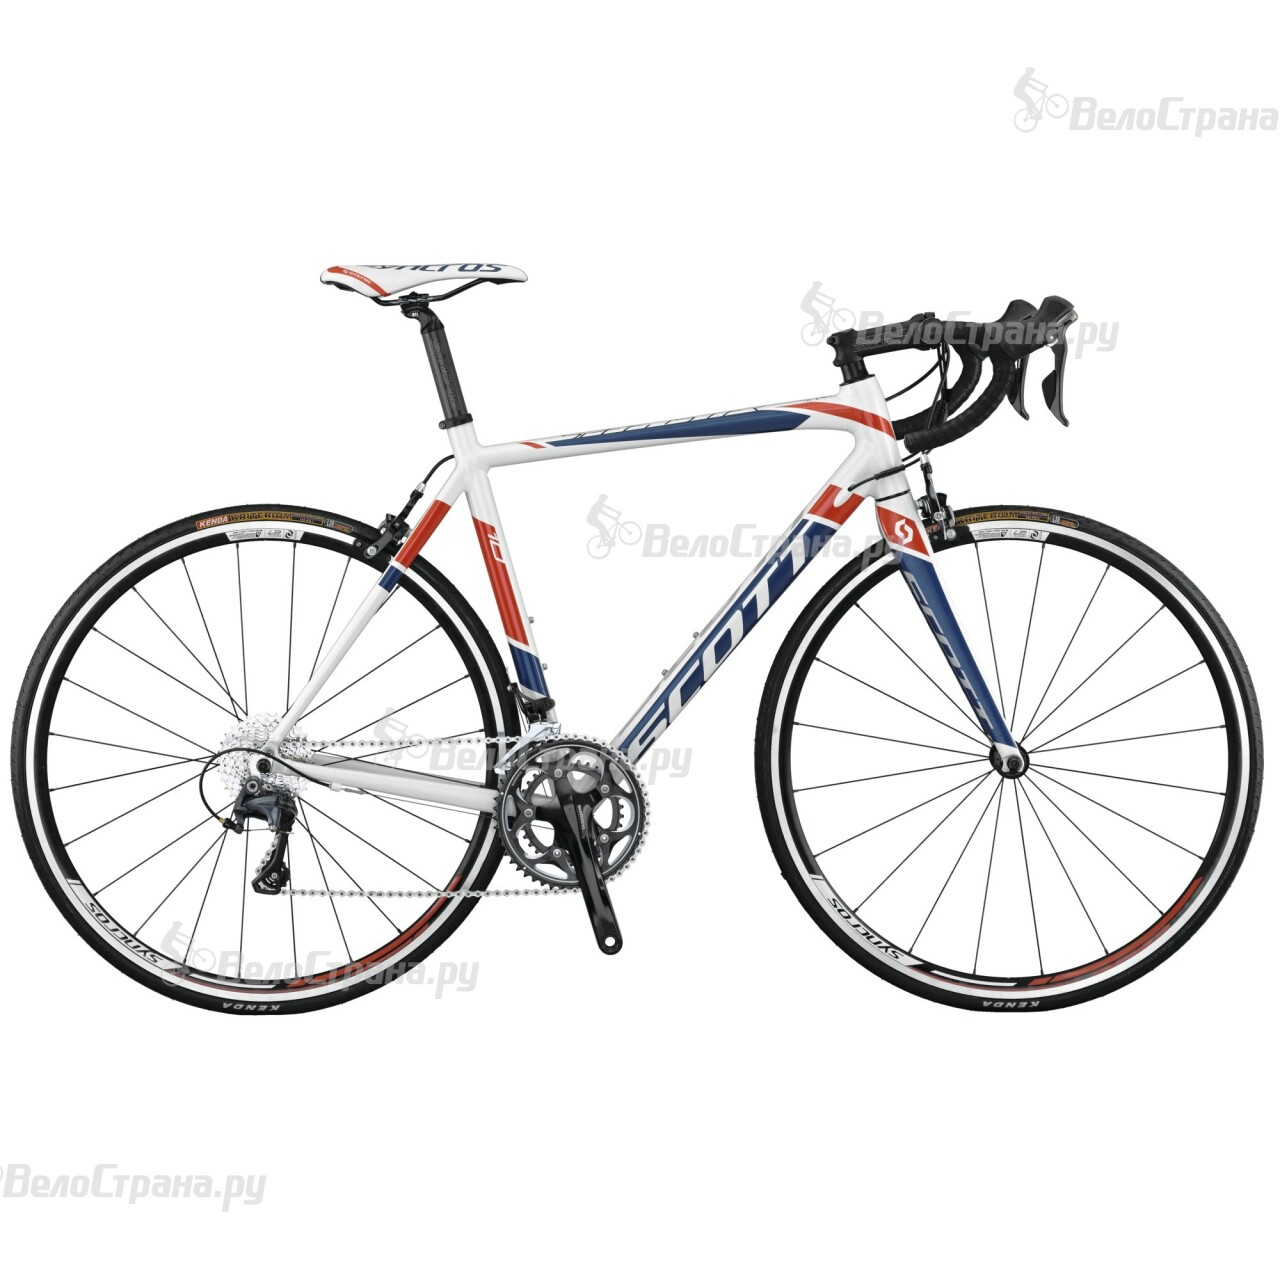 Велосипед Scott Speedster 10 Compact (2015)